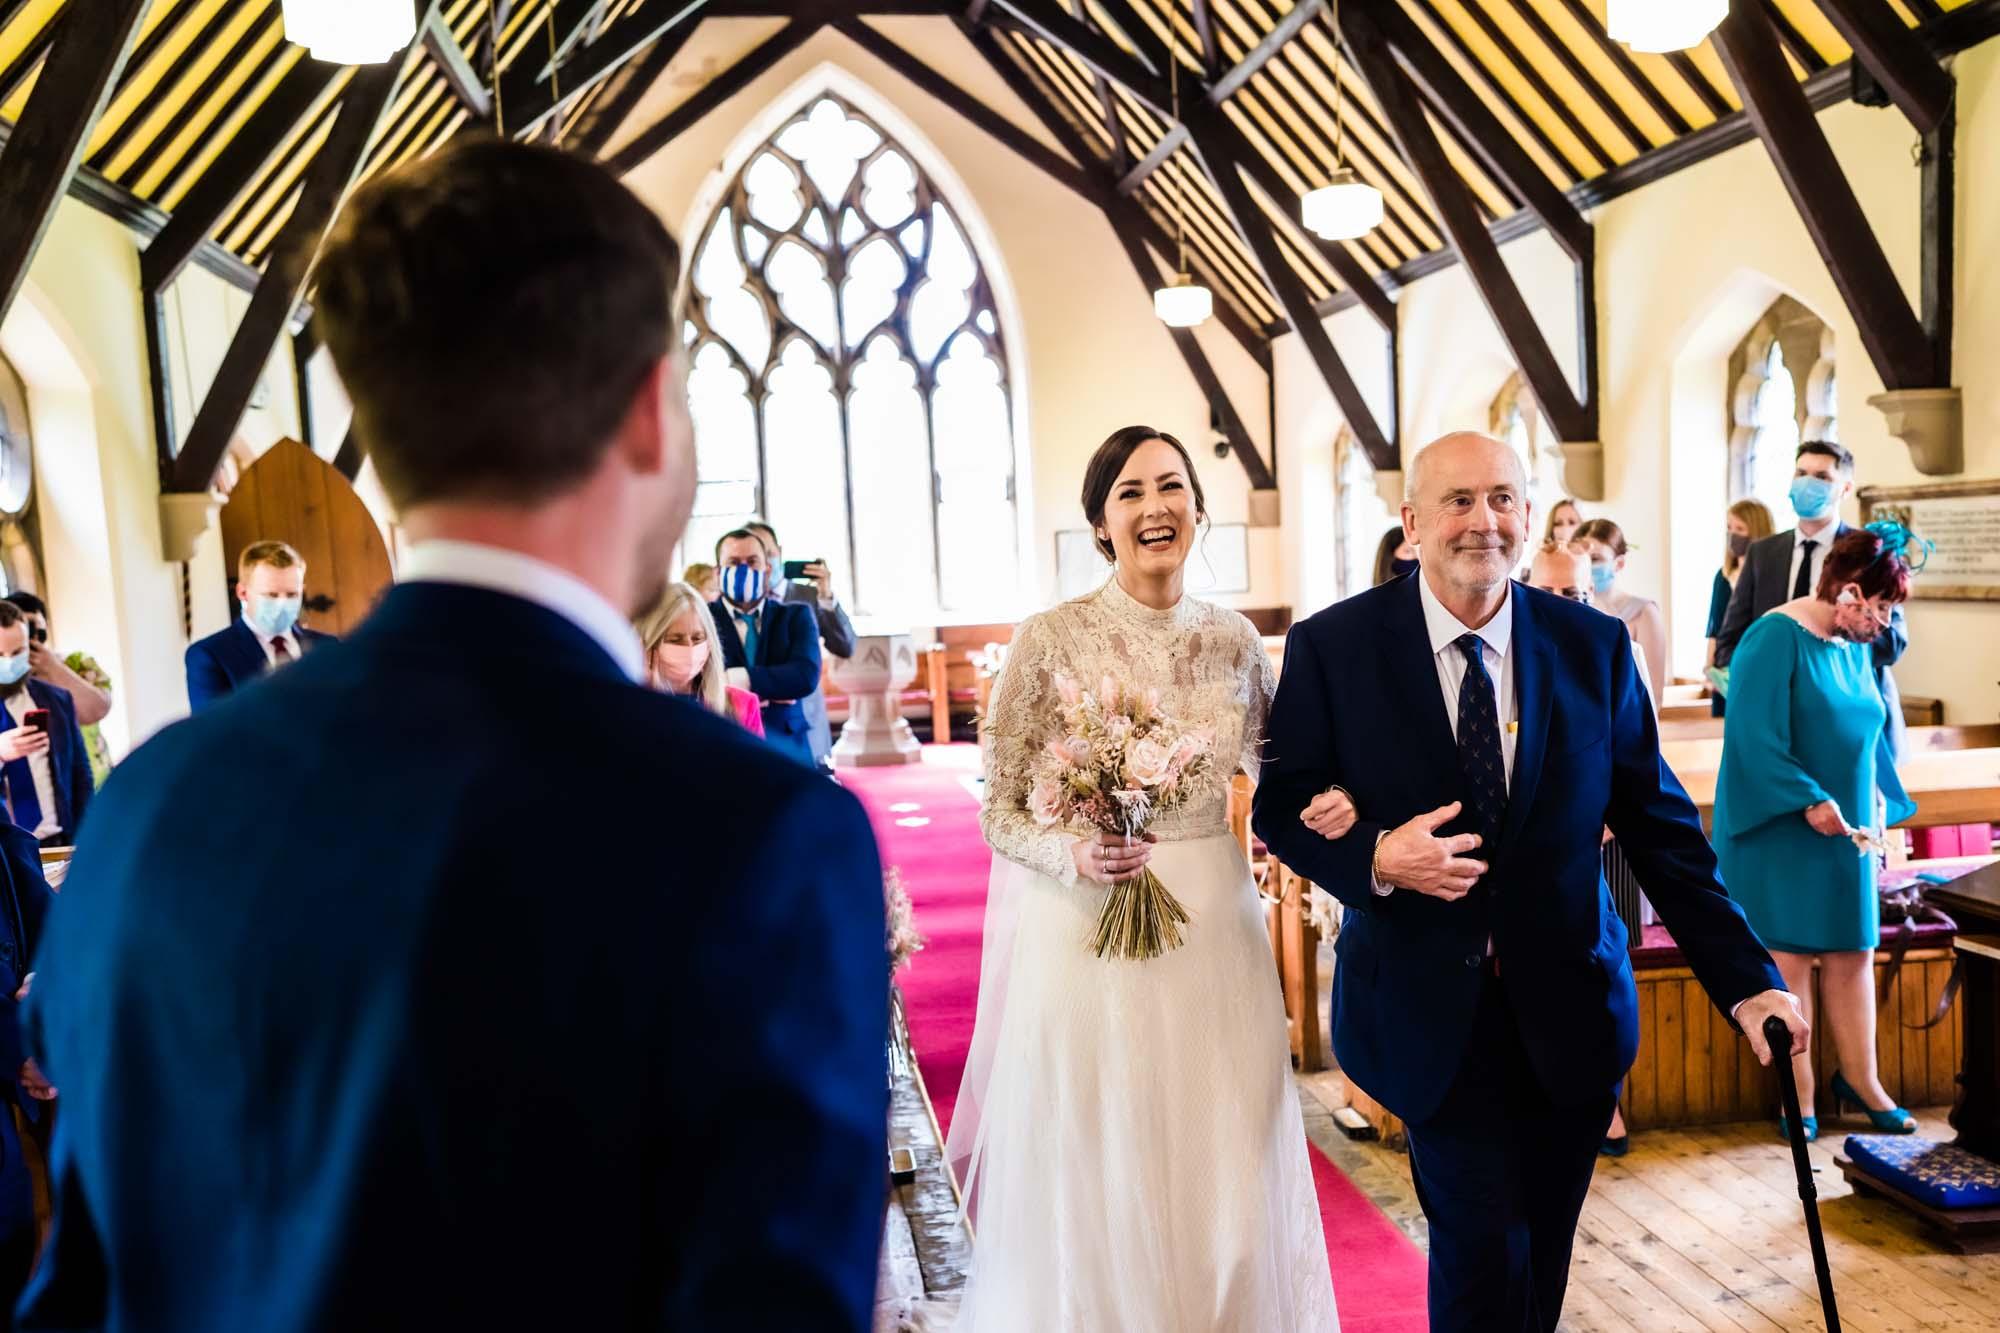 St Marks Dunham Massey Wedding